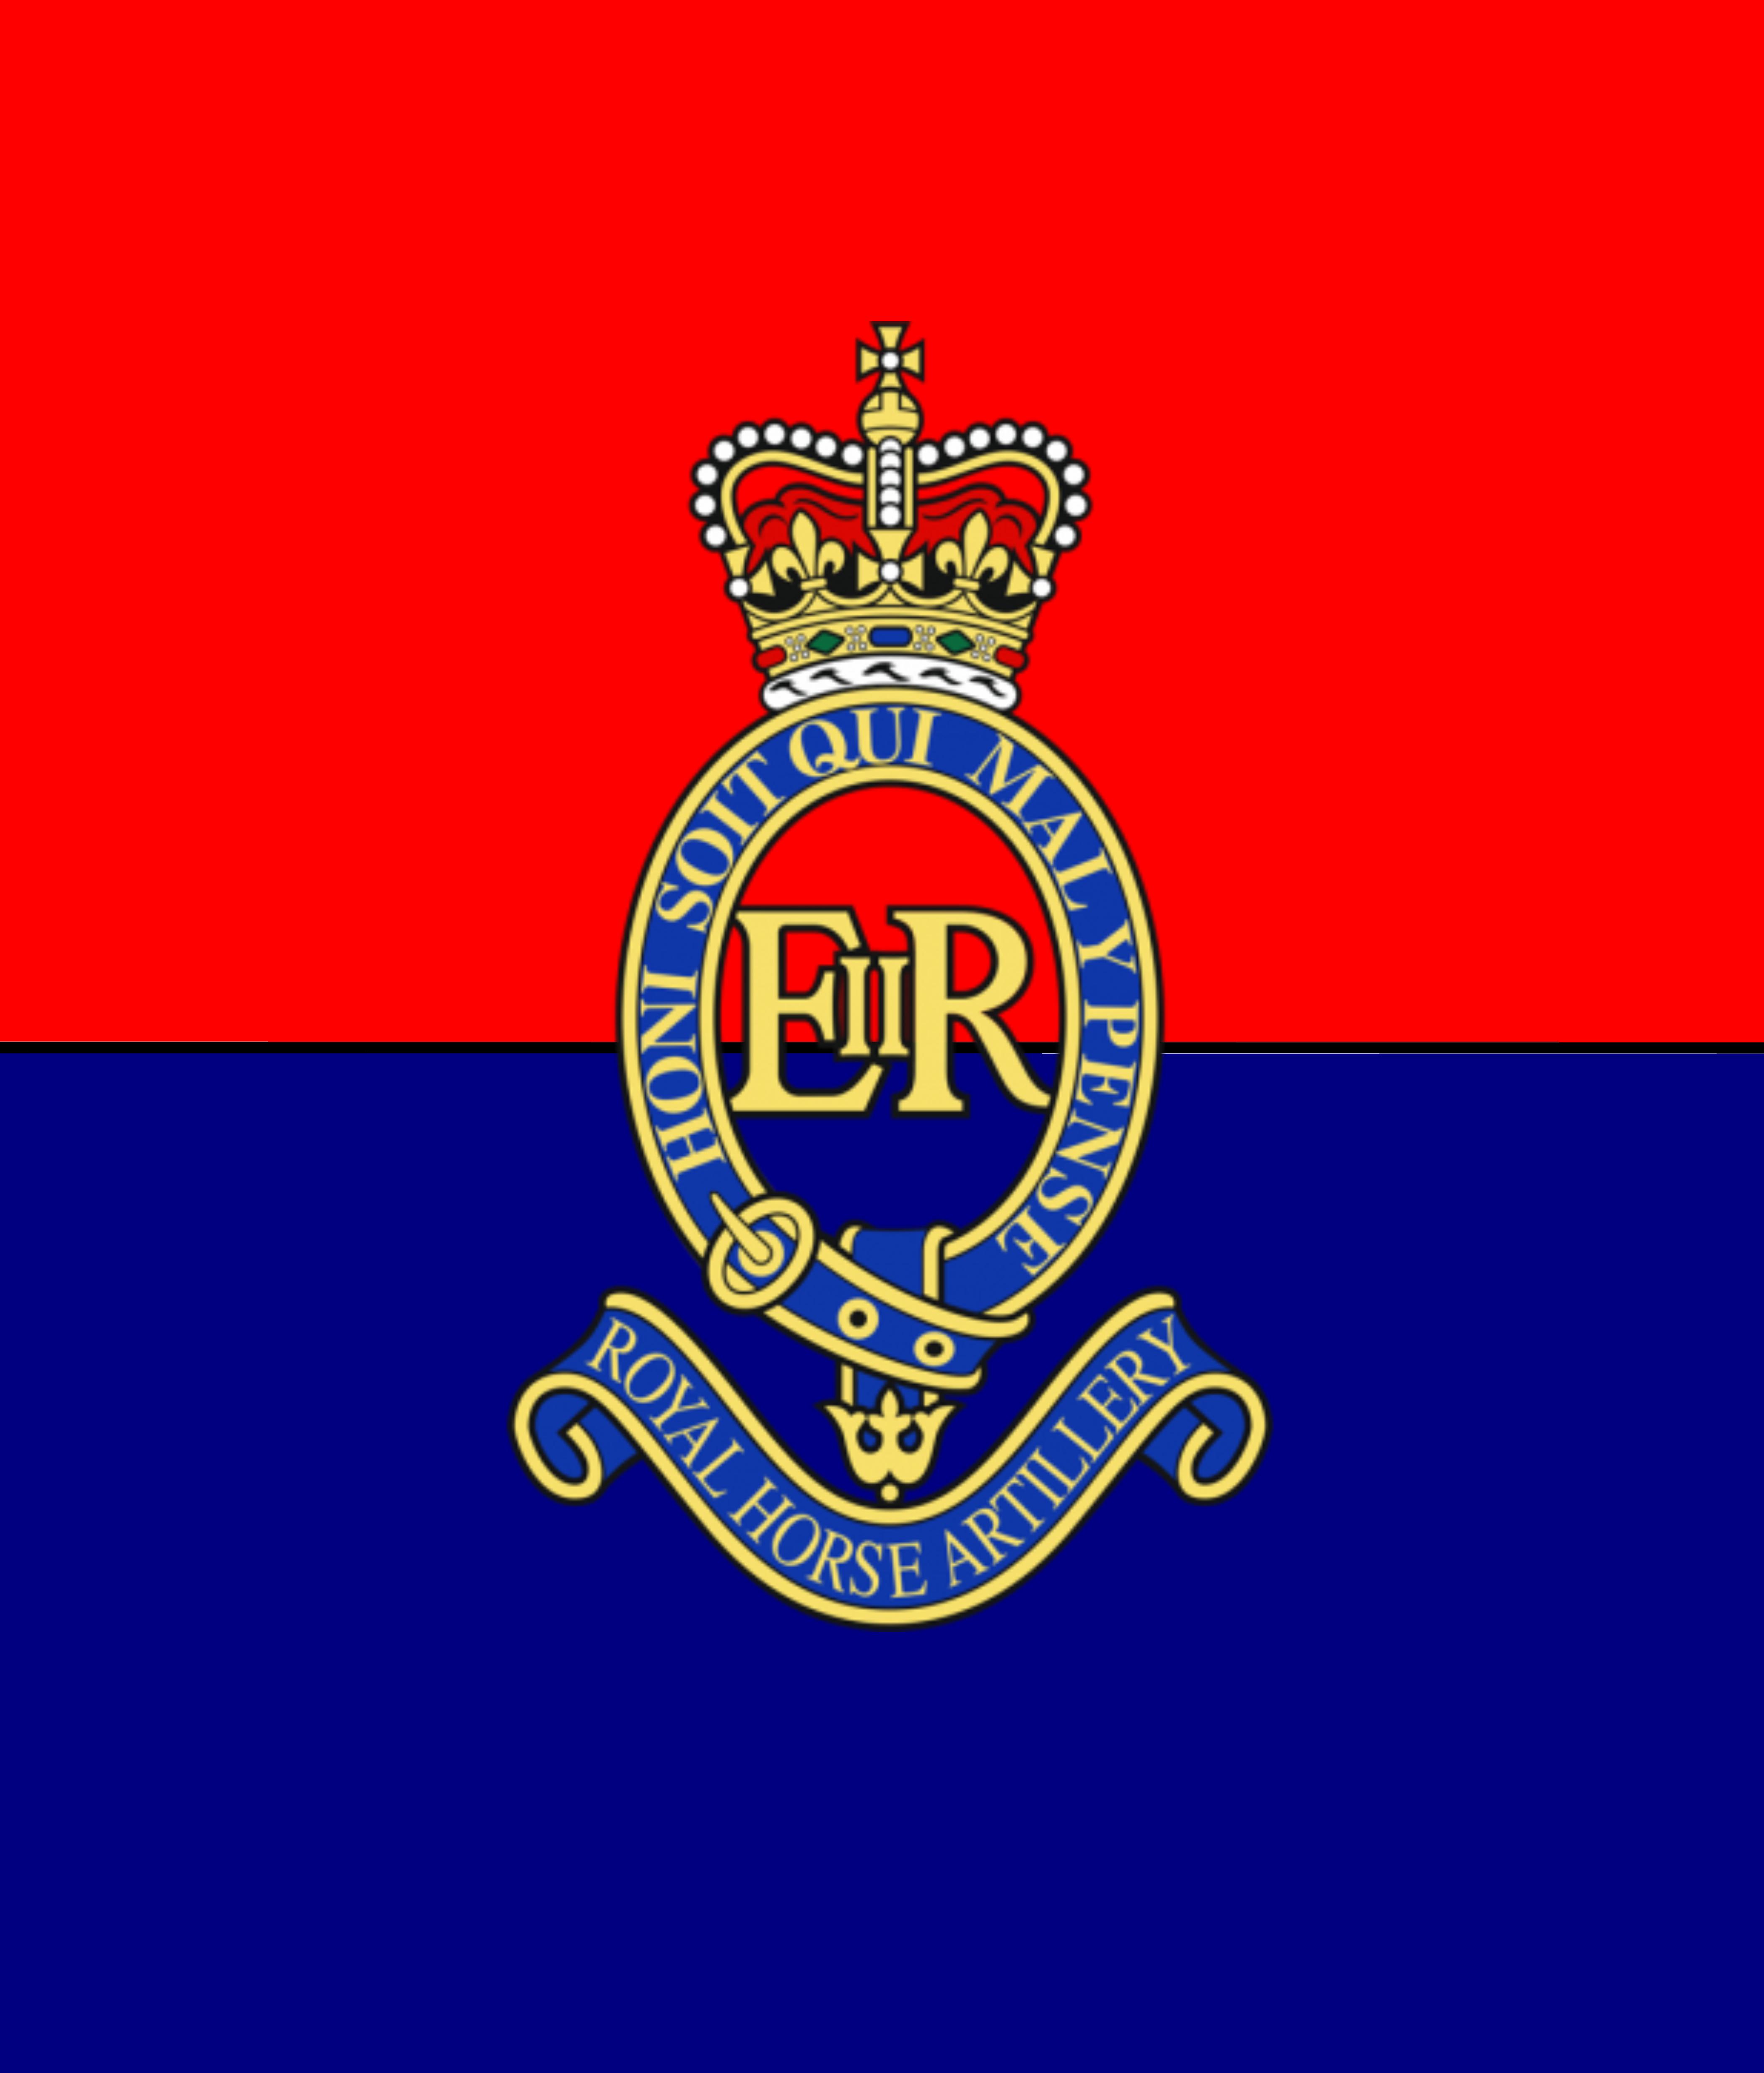 Royal Horse Atrillery British army regiments